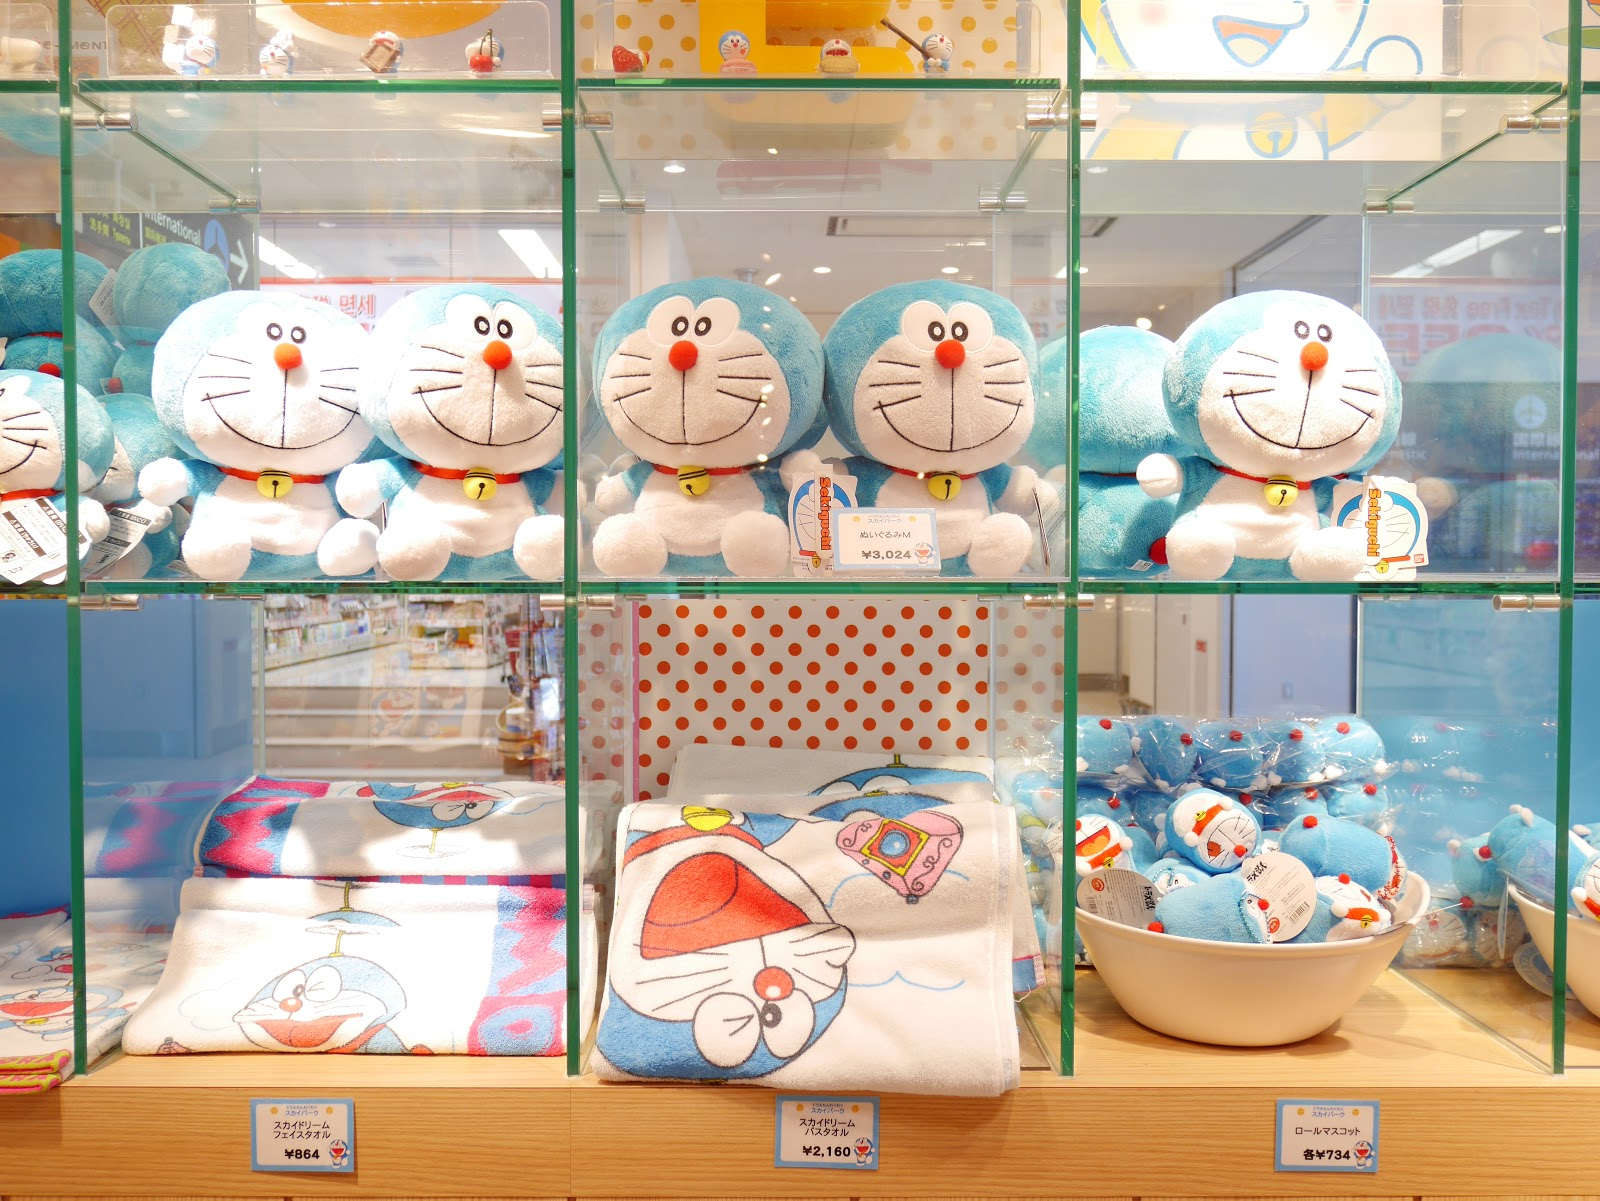 Entry Bergambar Hokkaido Day 1 Media Panas Tcash Vaganza 17 Kk New Motif 2016 Everywhere Also Doraemon